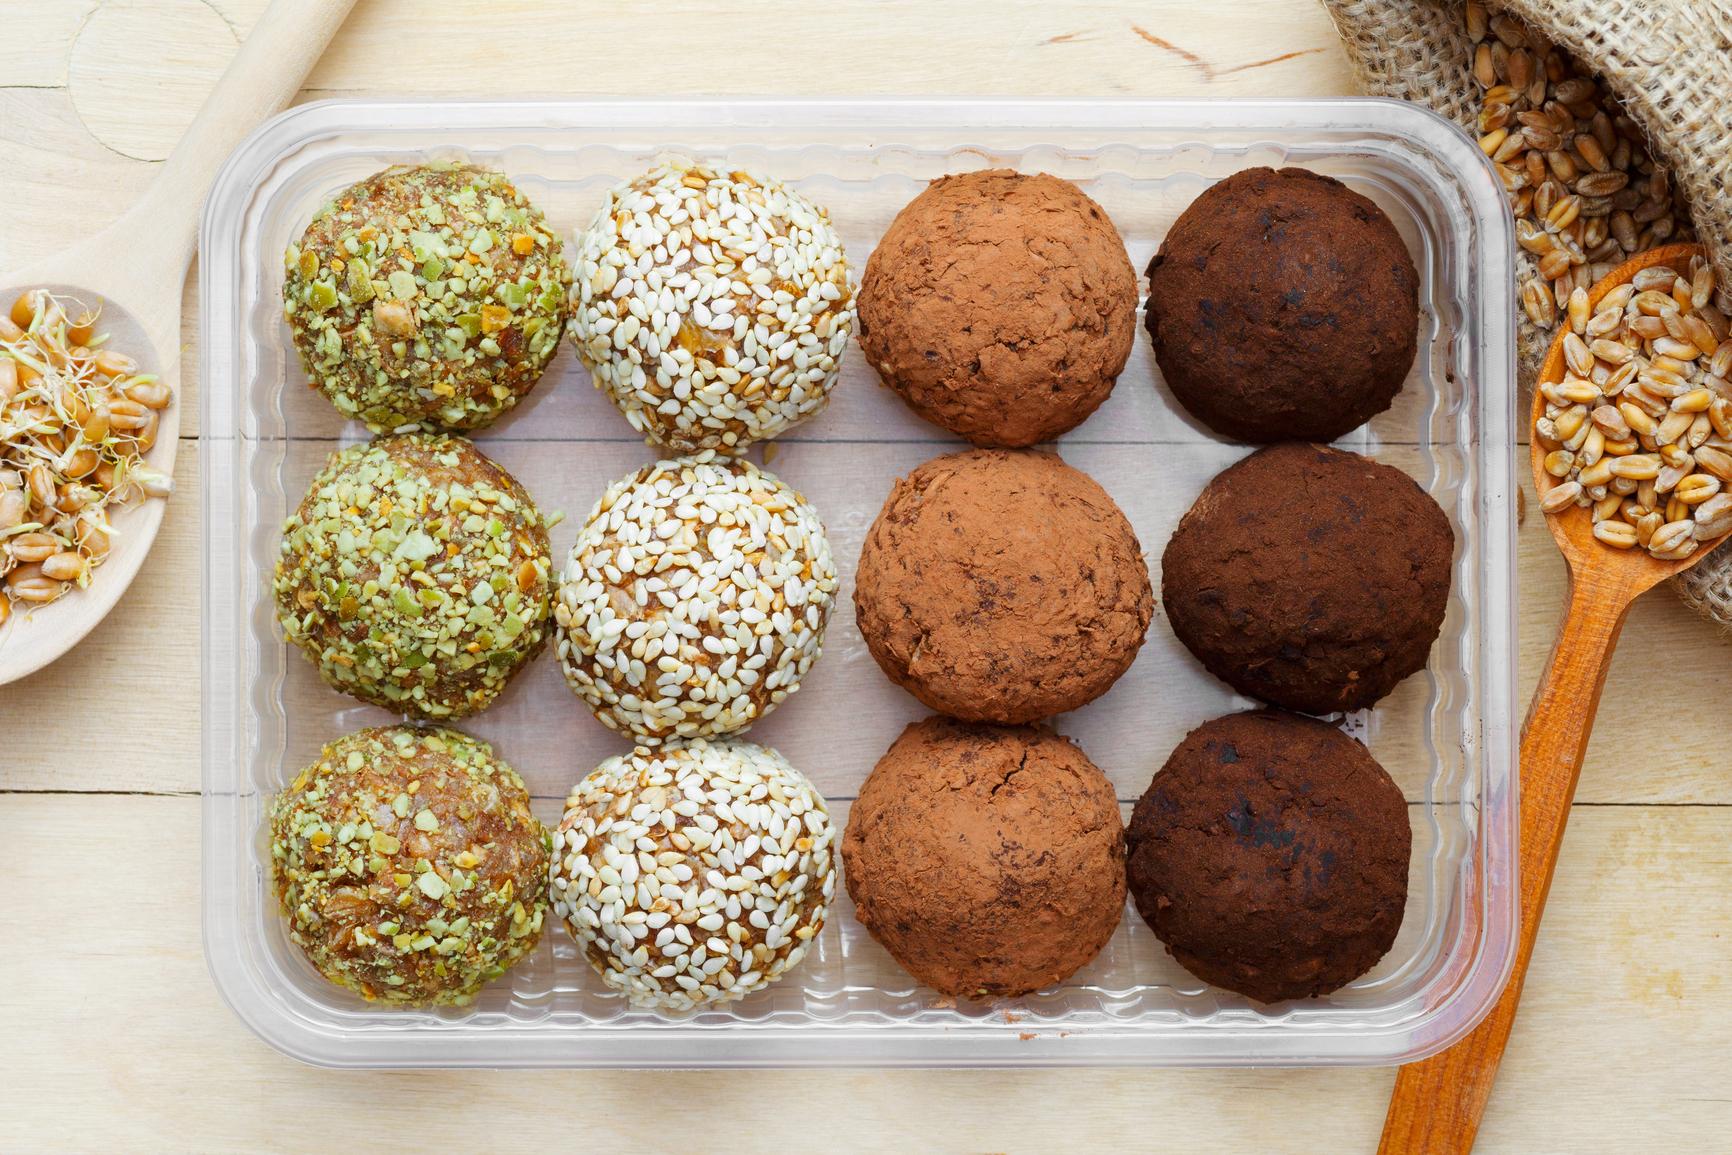 Пять рецептов домашних конфет без сахара